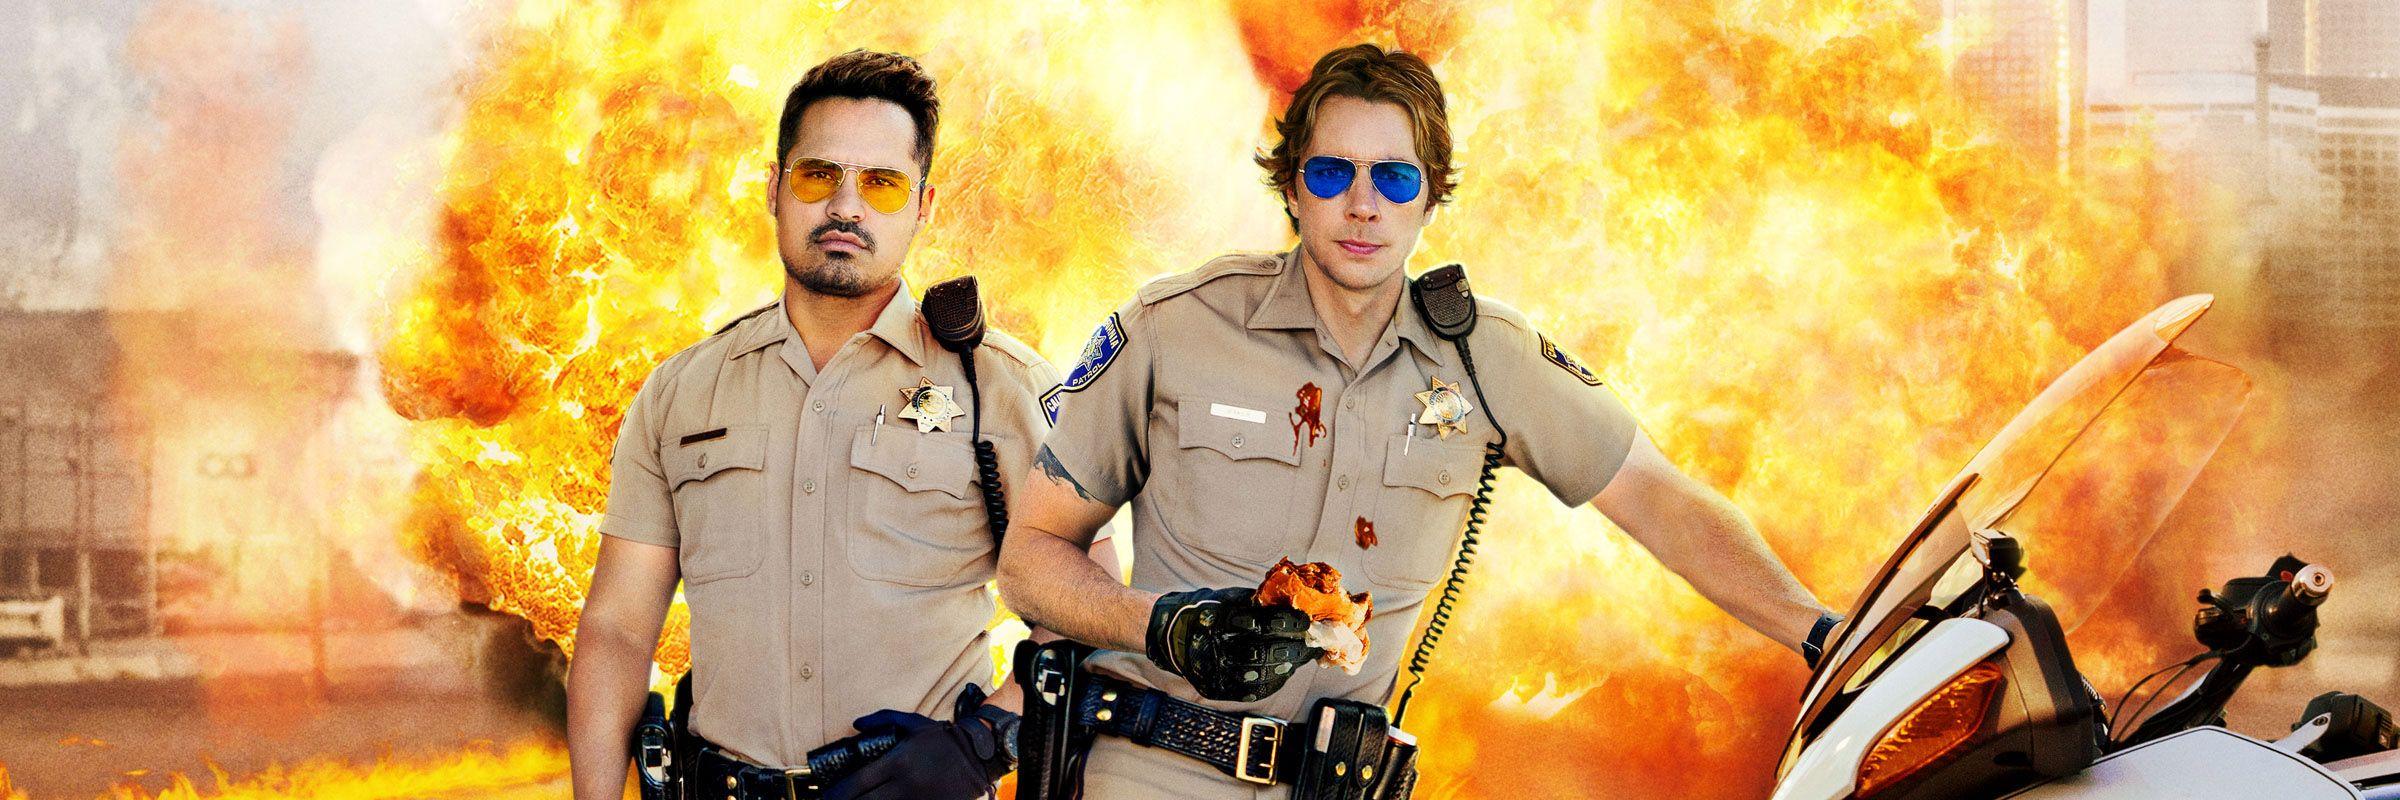 CHiPs | Full Movie | Movies Anywhere